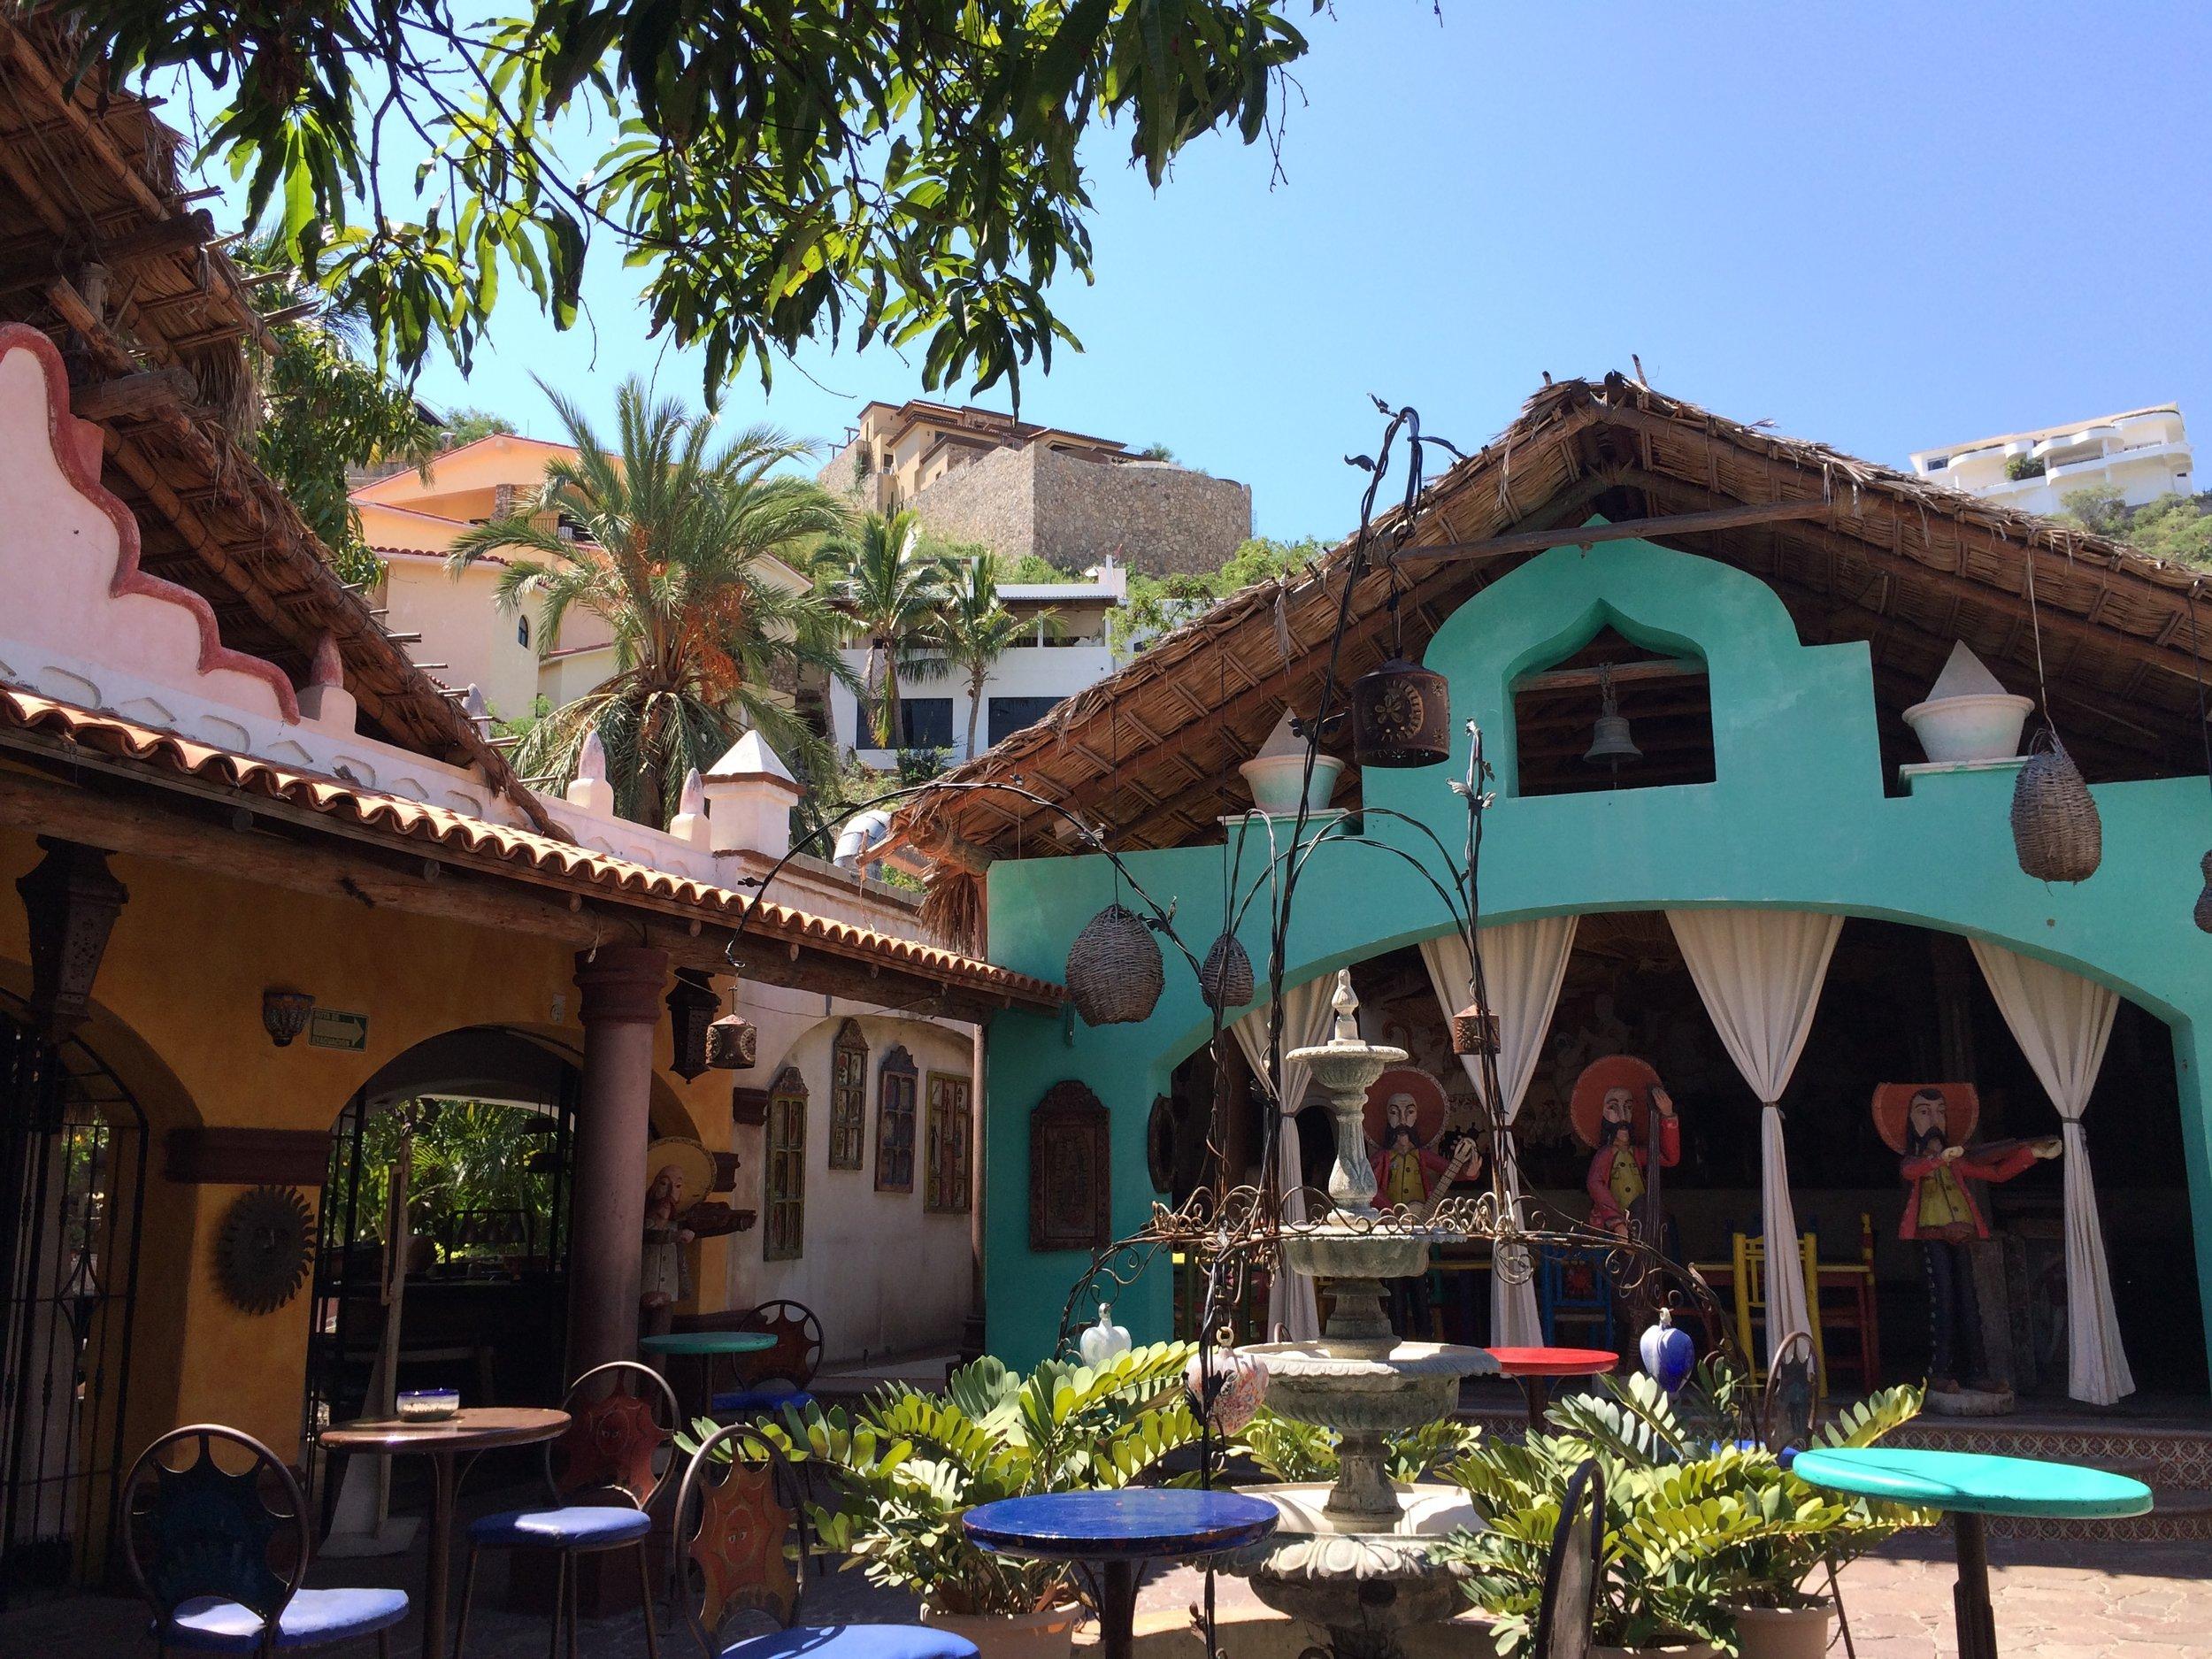 Mexico villa.JPG